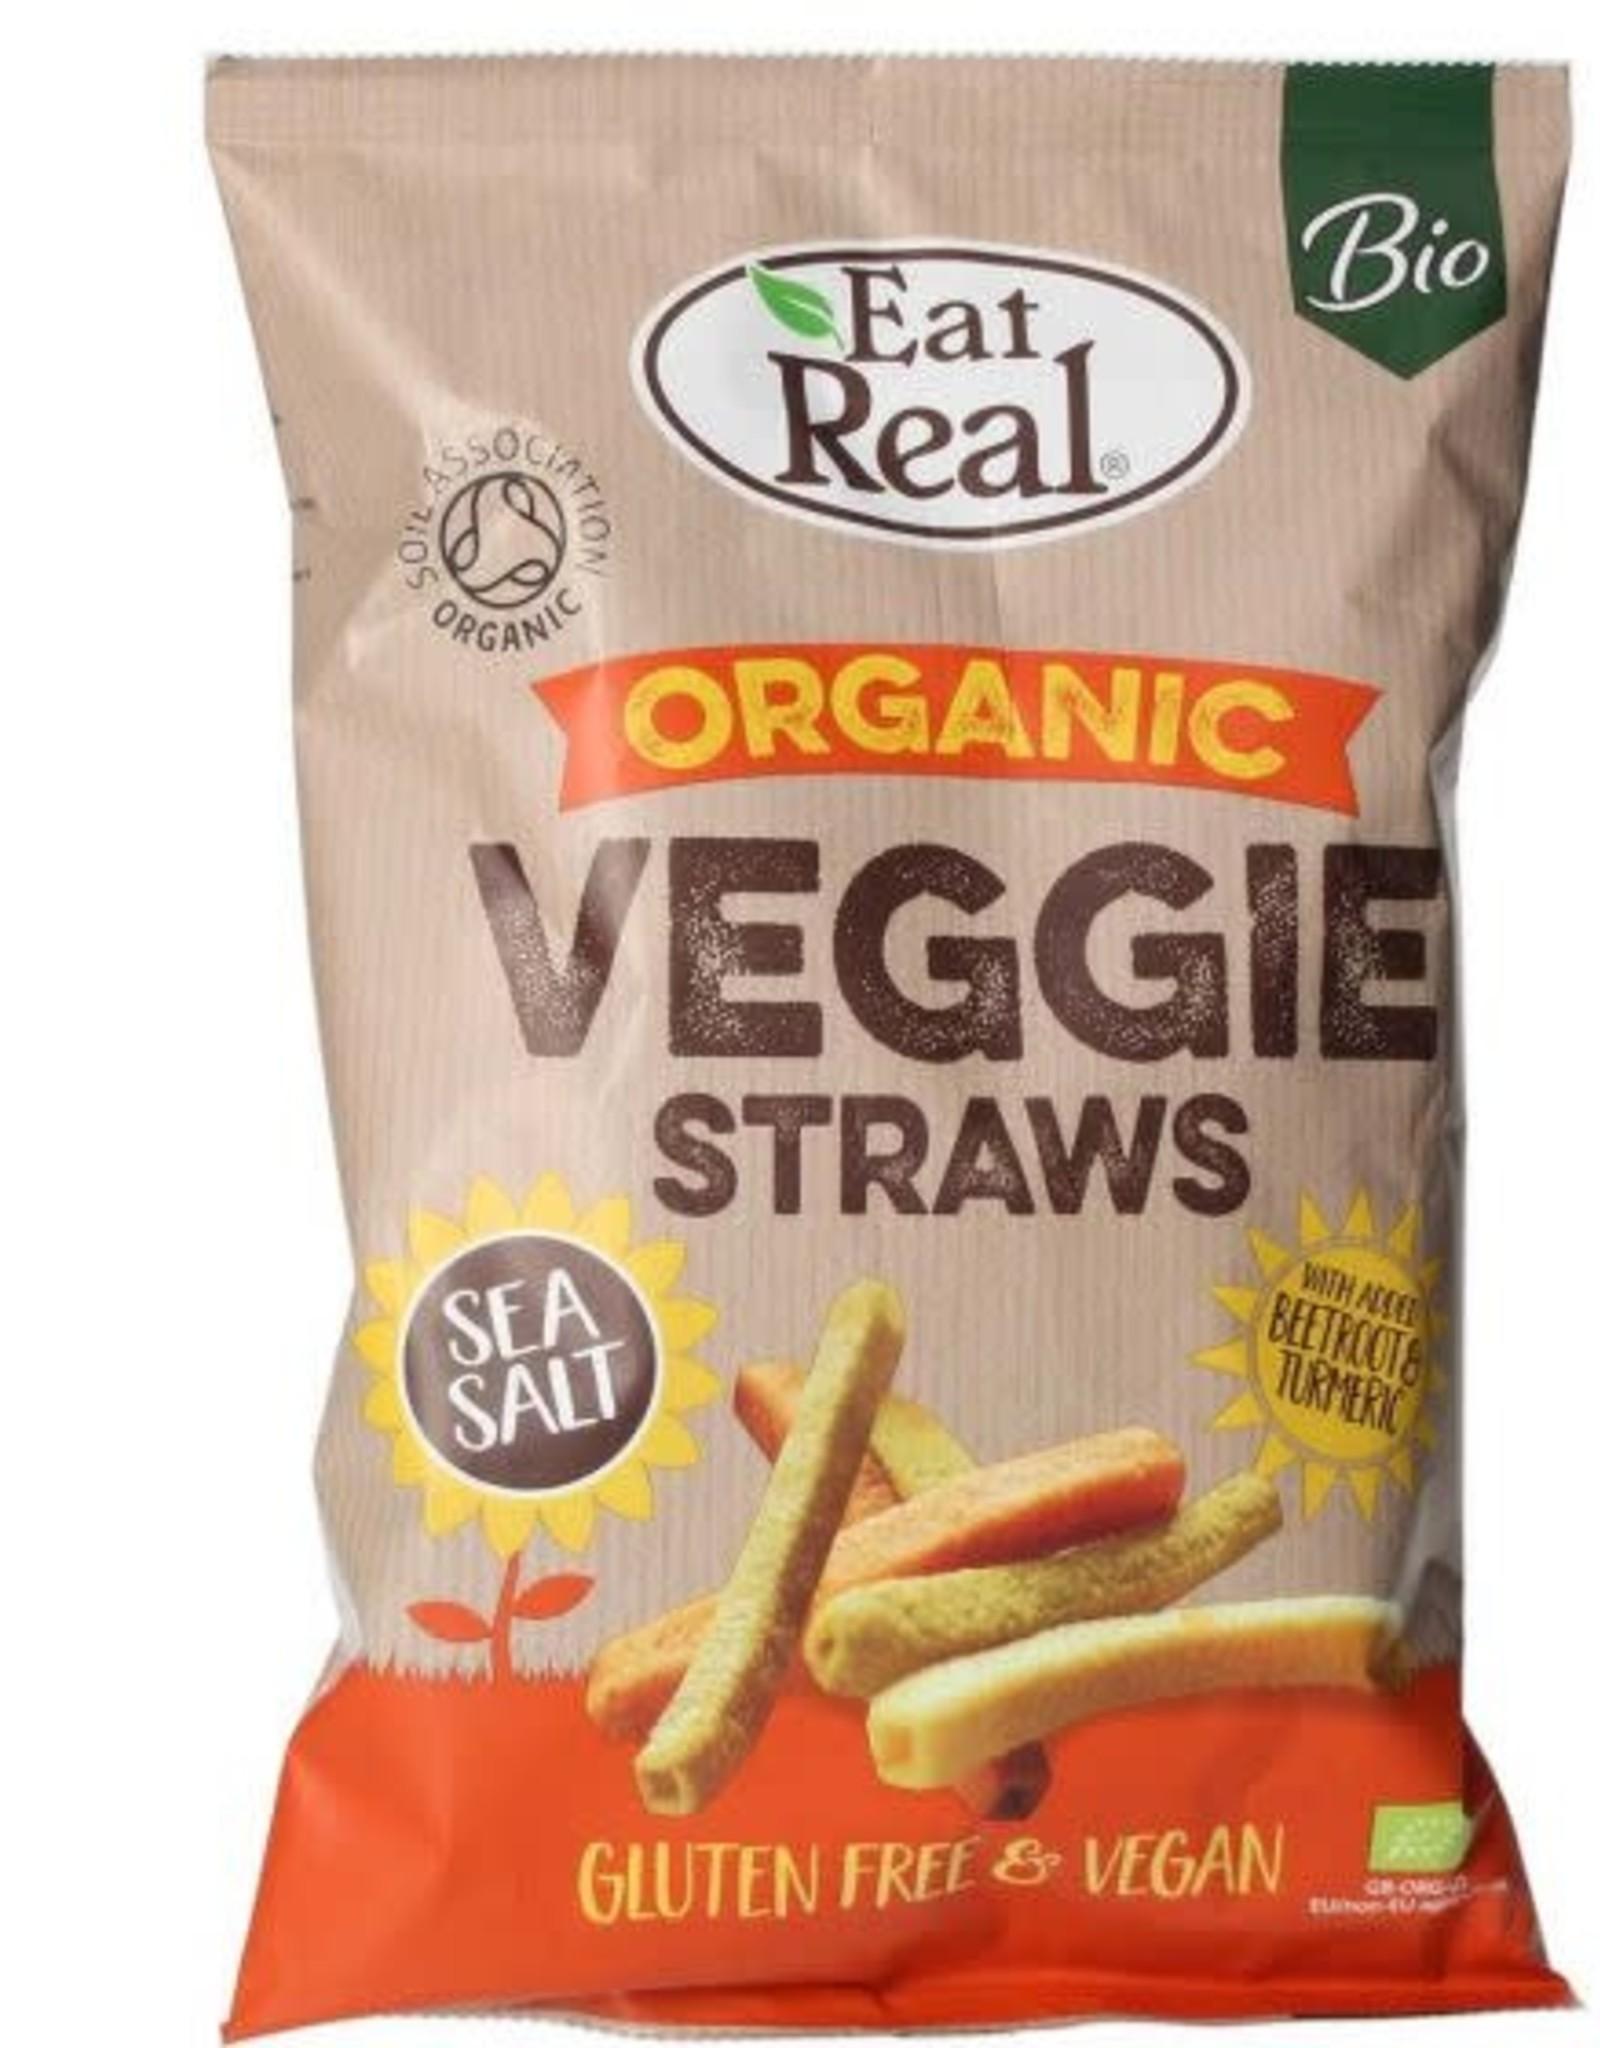 Eat Real Eat Real Veggie Straws